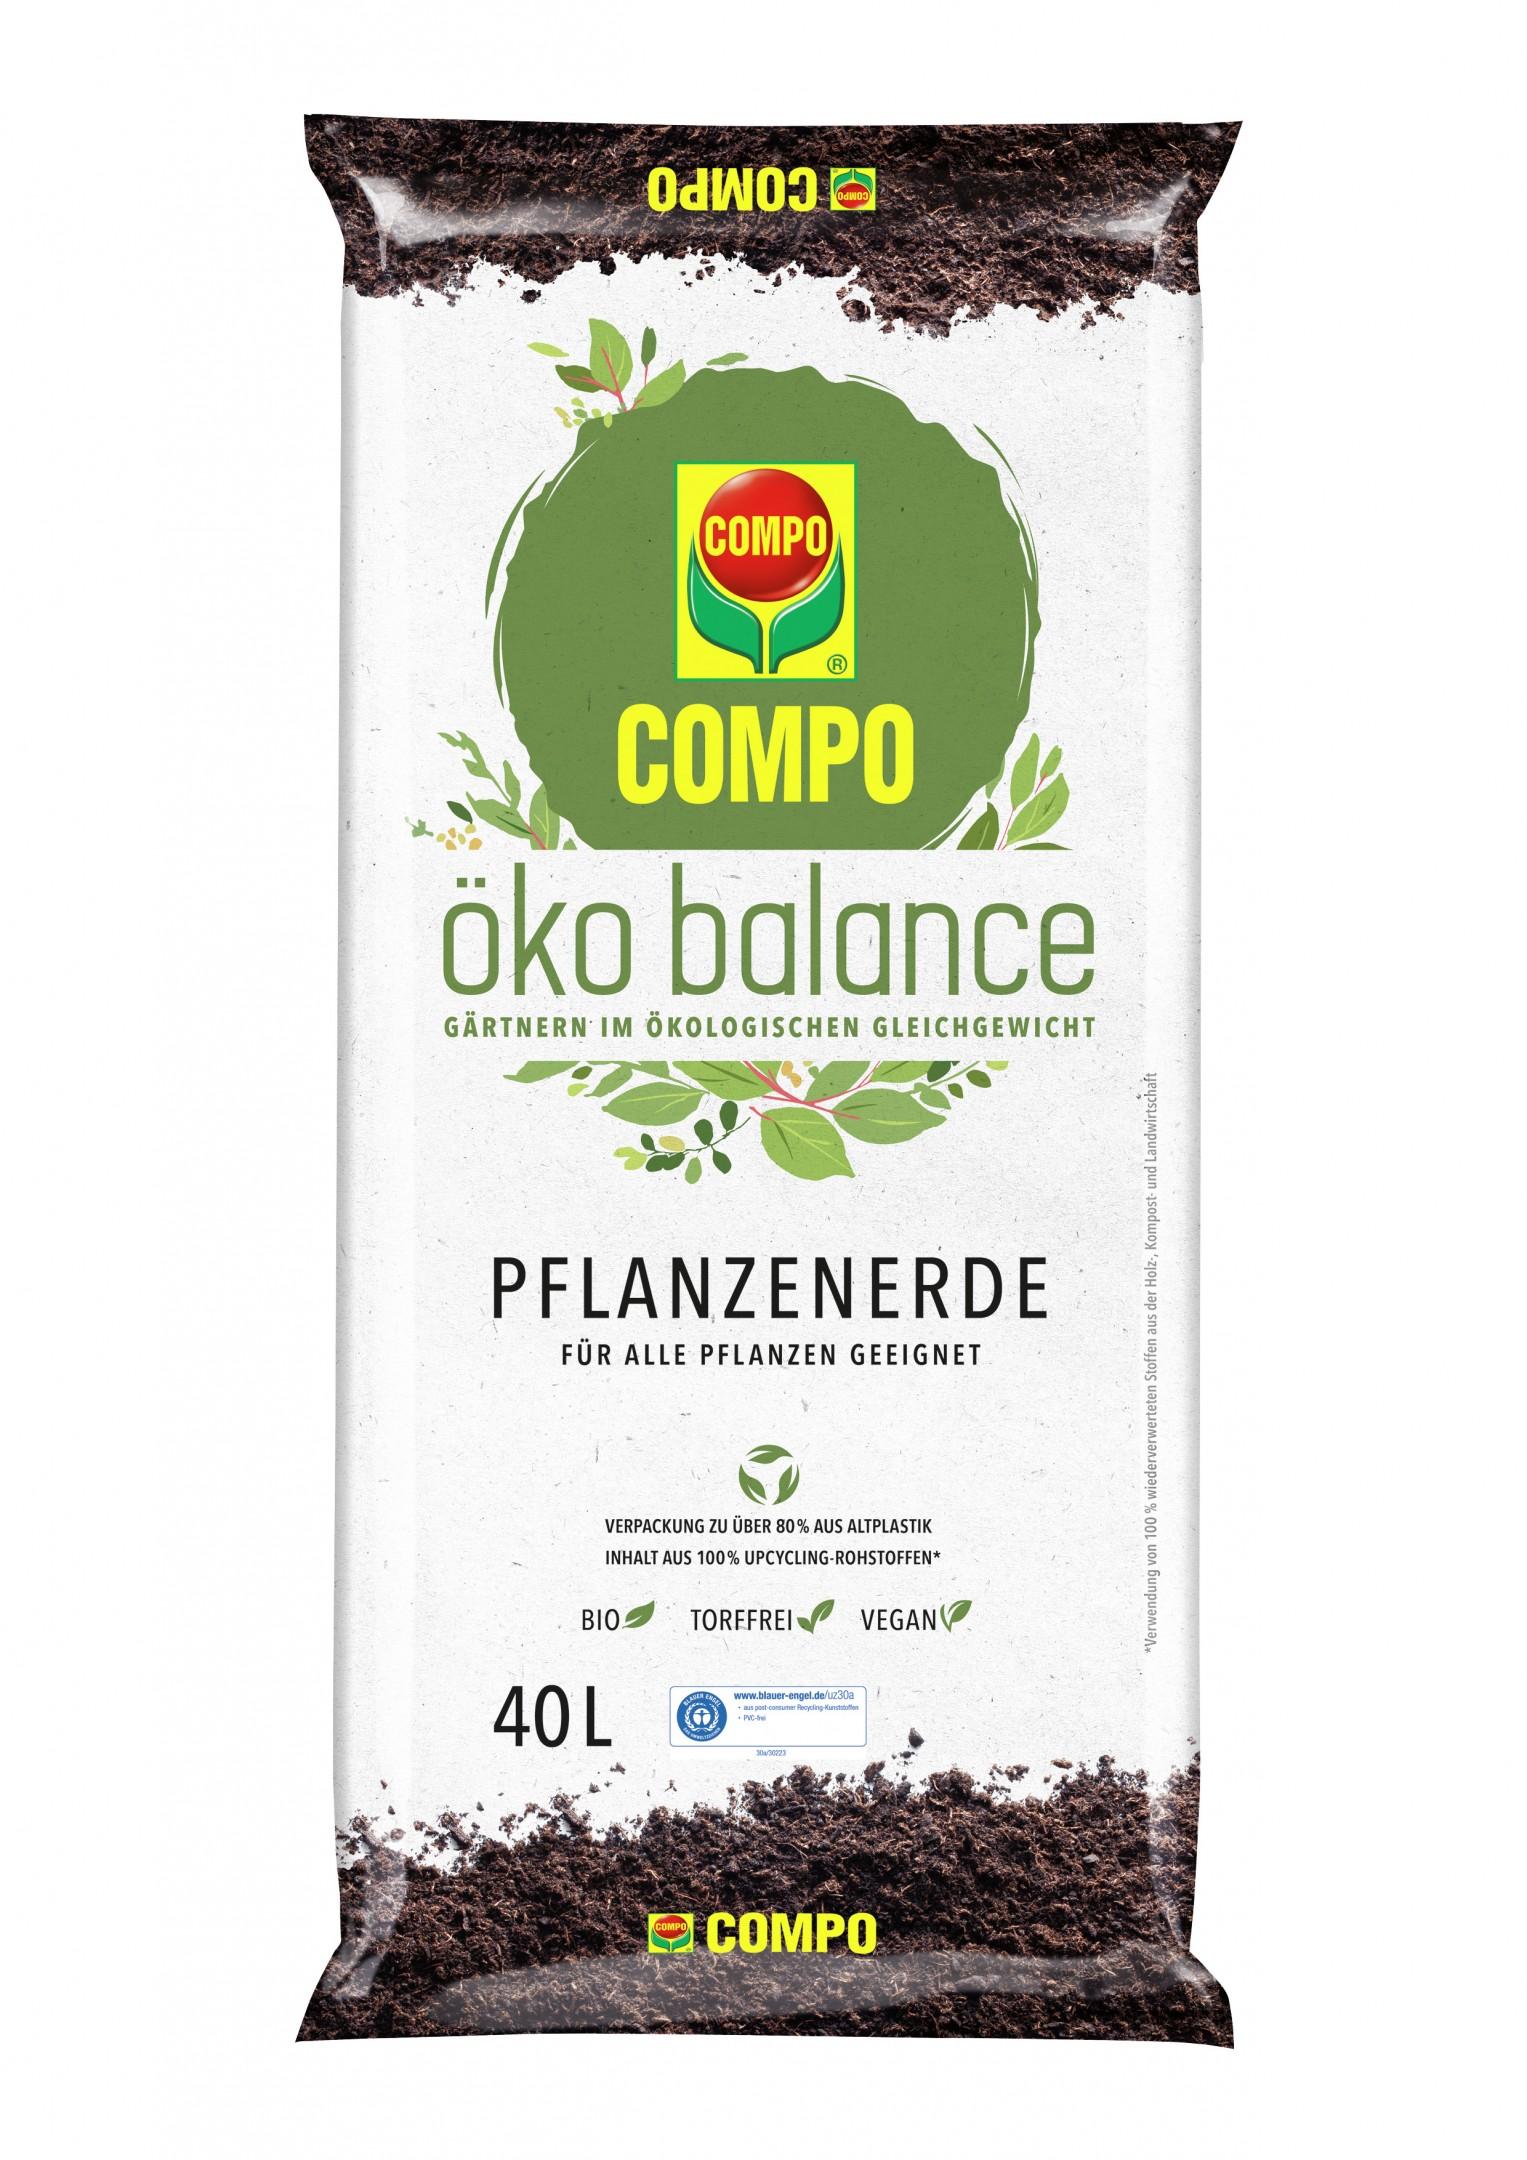 COMPO öko balance Pflanzenerde 40 L Bild 1